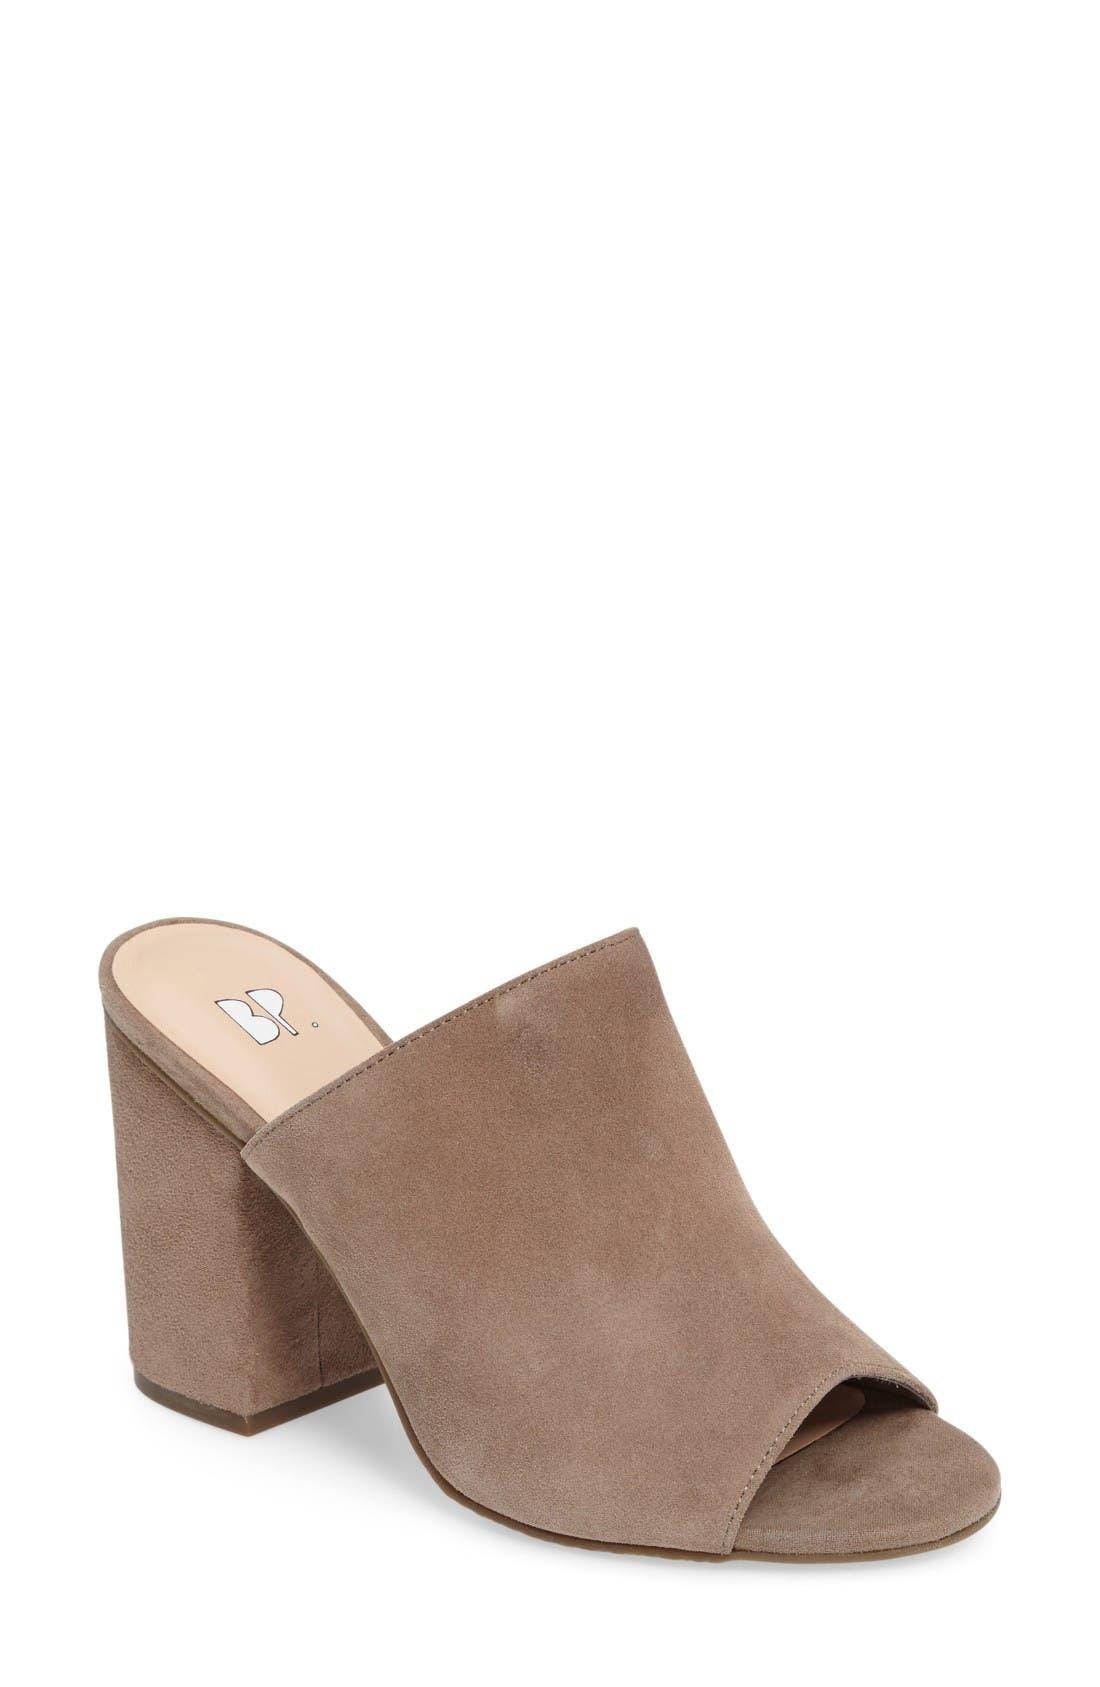 Alternate Image 1 Selected - BP. Tale Block Heel Sandal (Women)